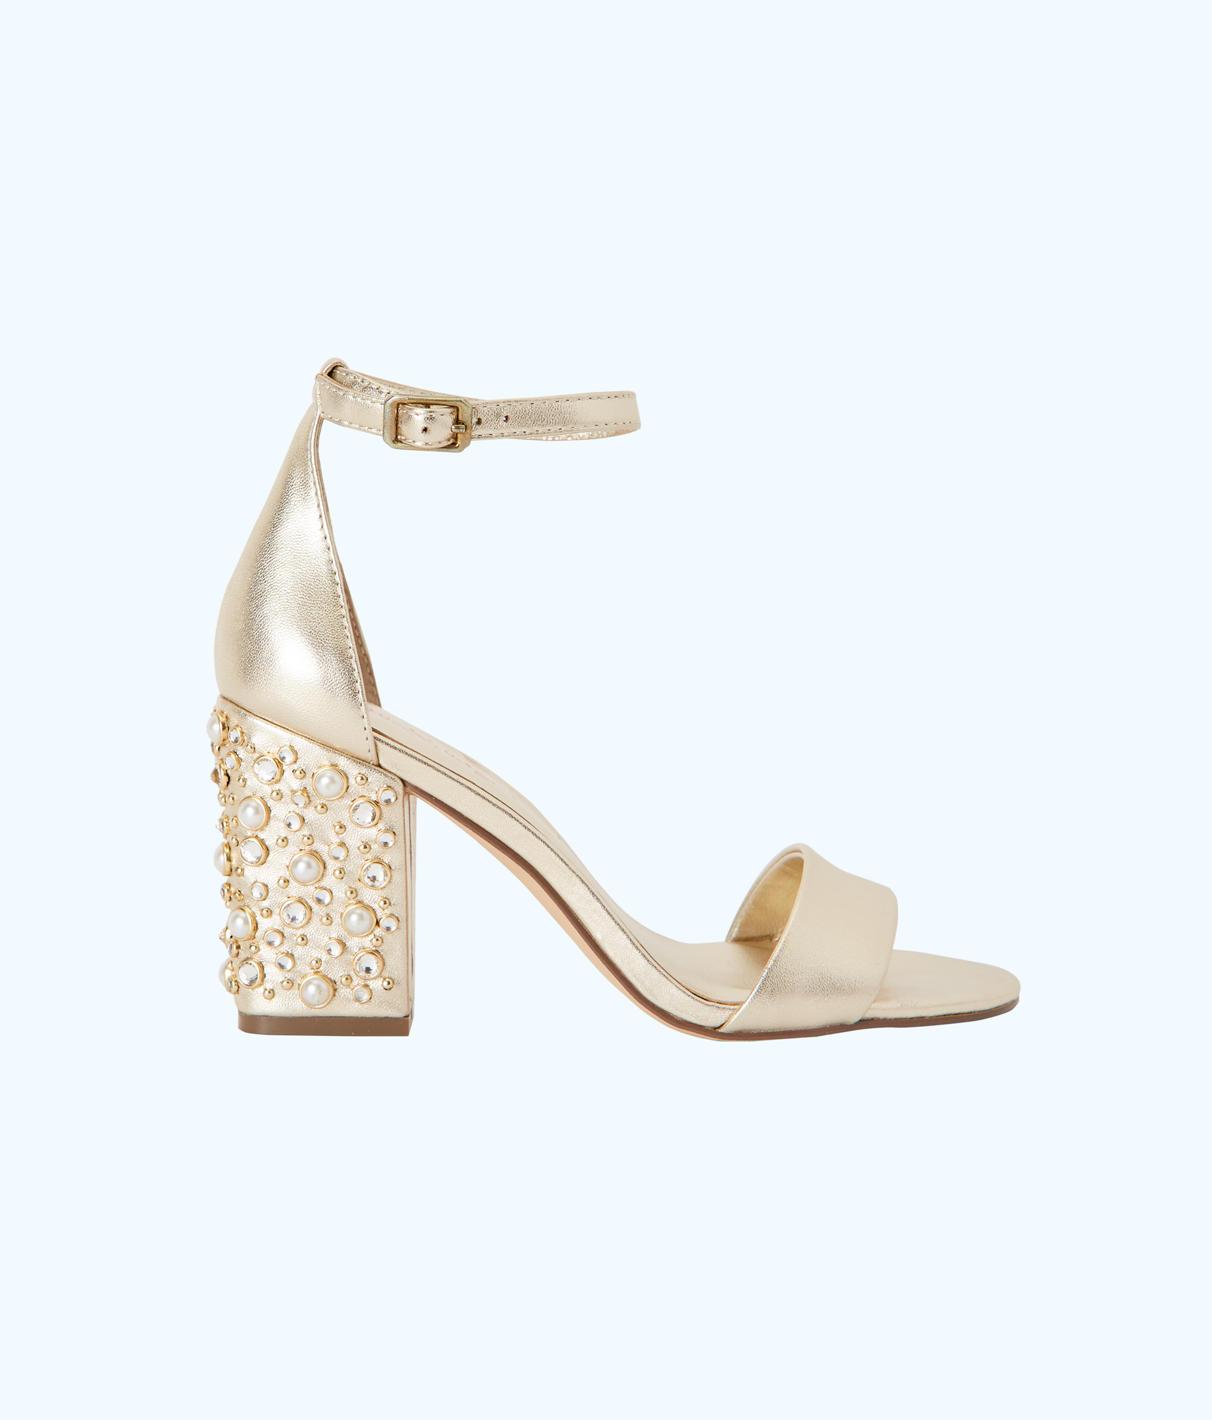 Lilly Pulitzer Amber Lynn Embellished Sandal In Gold Metallic